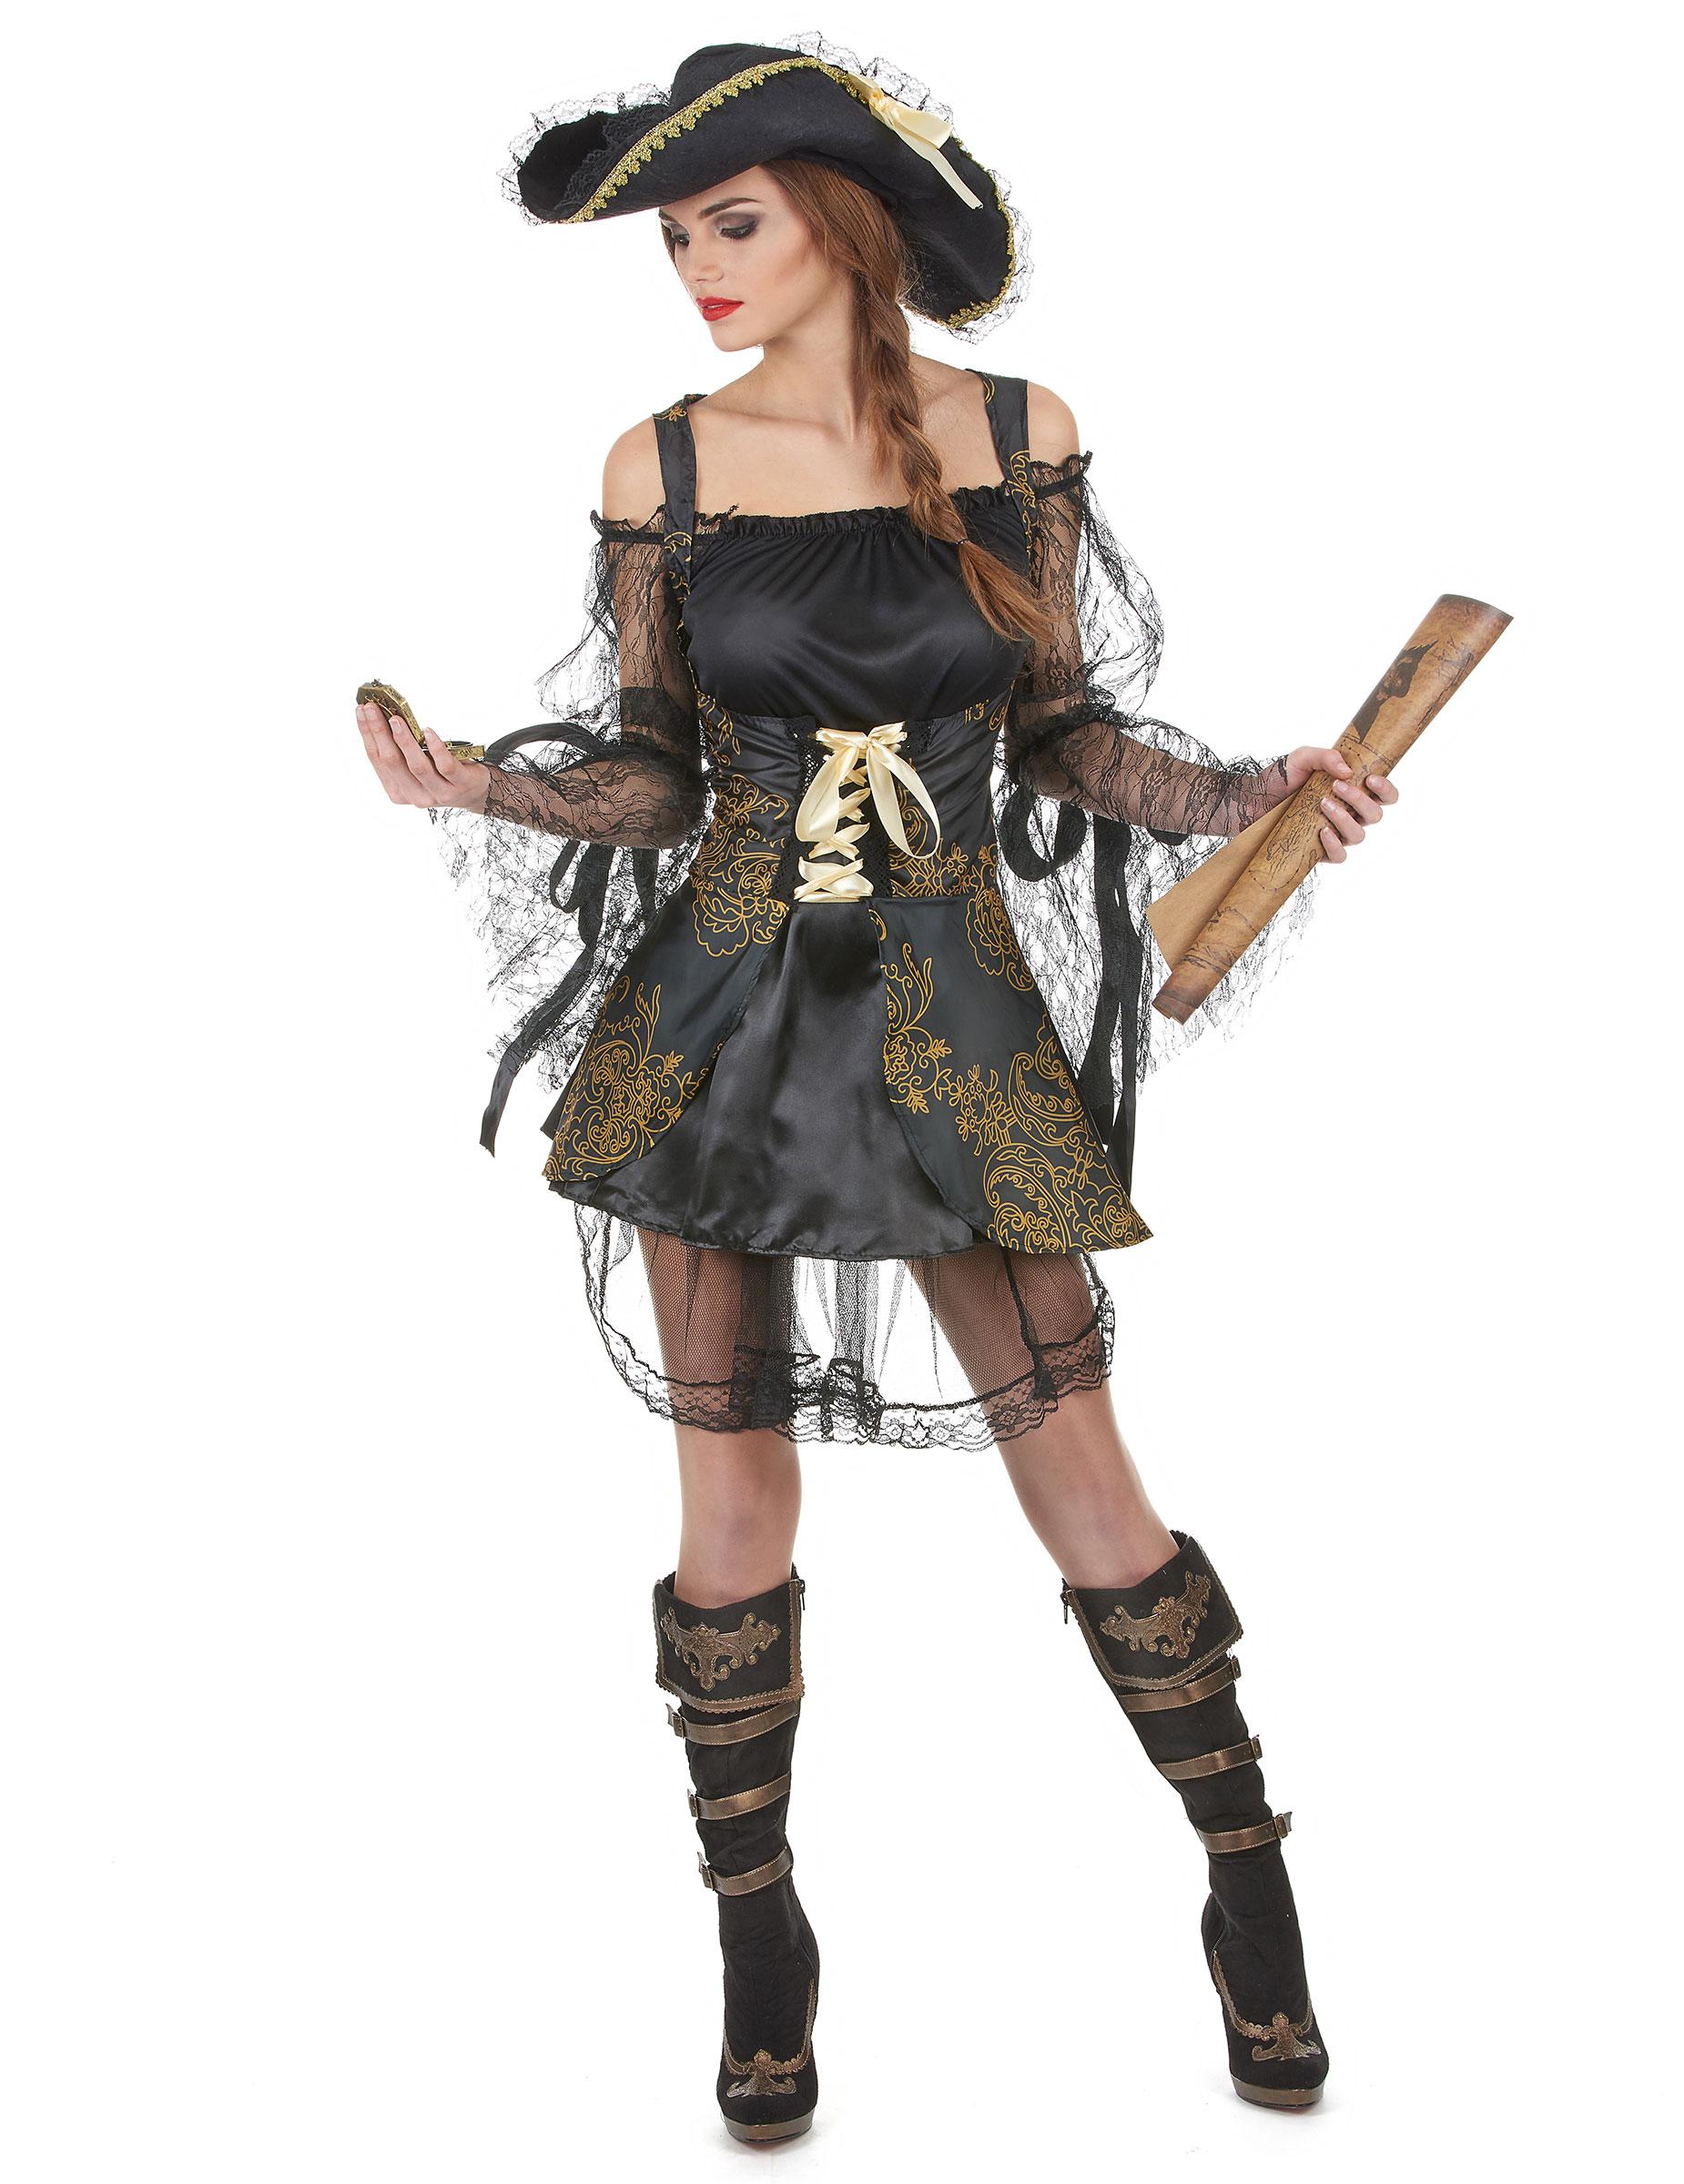 Costume De Pirate Femme Gamme Luxe